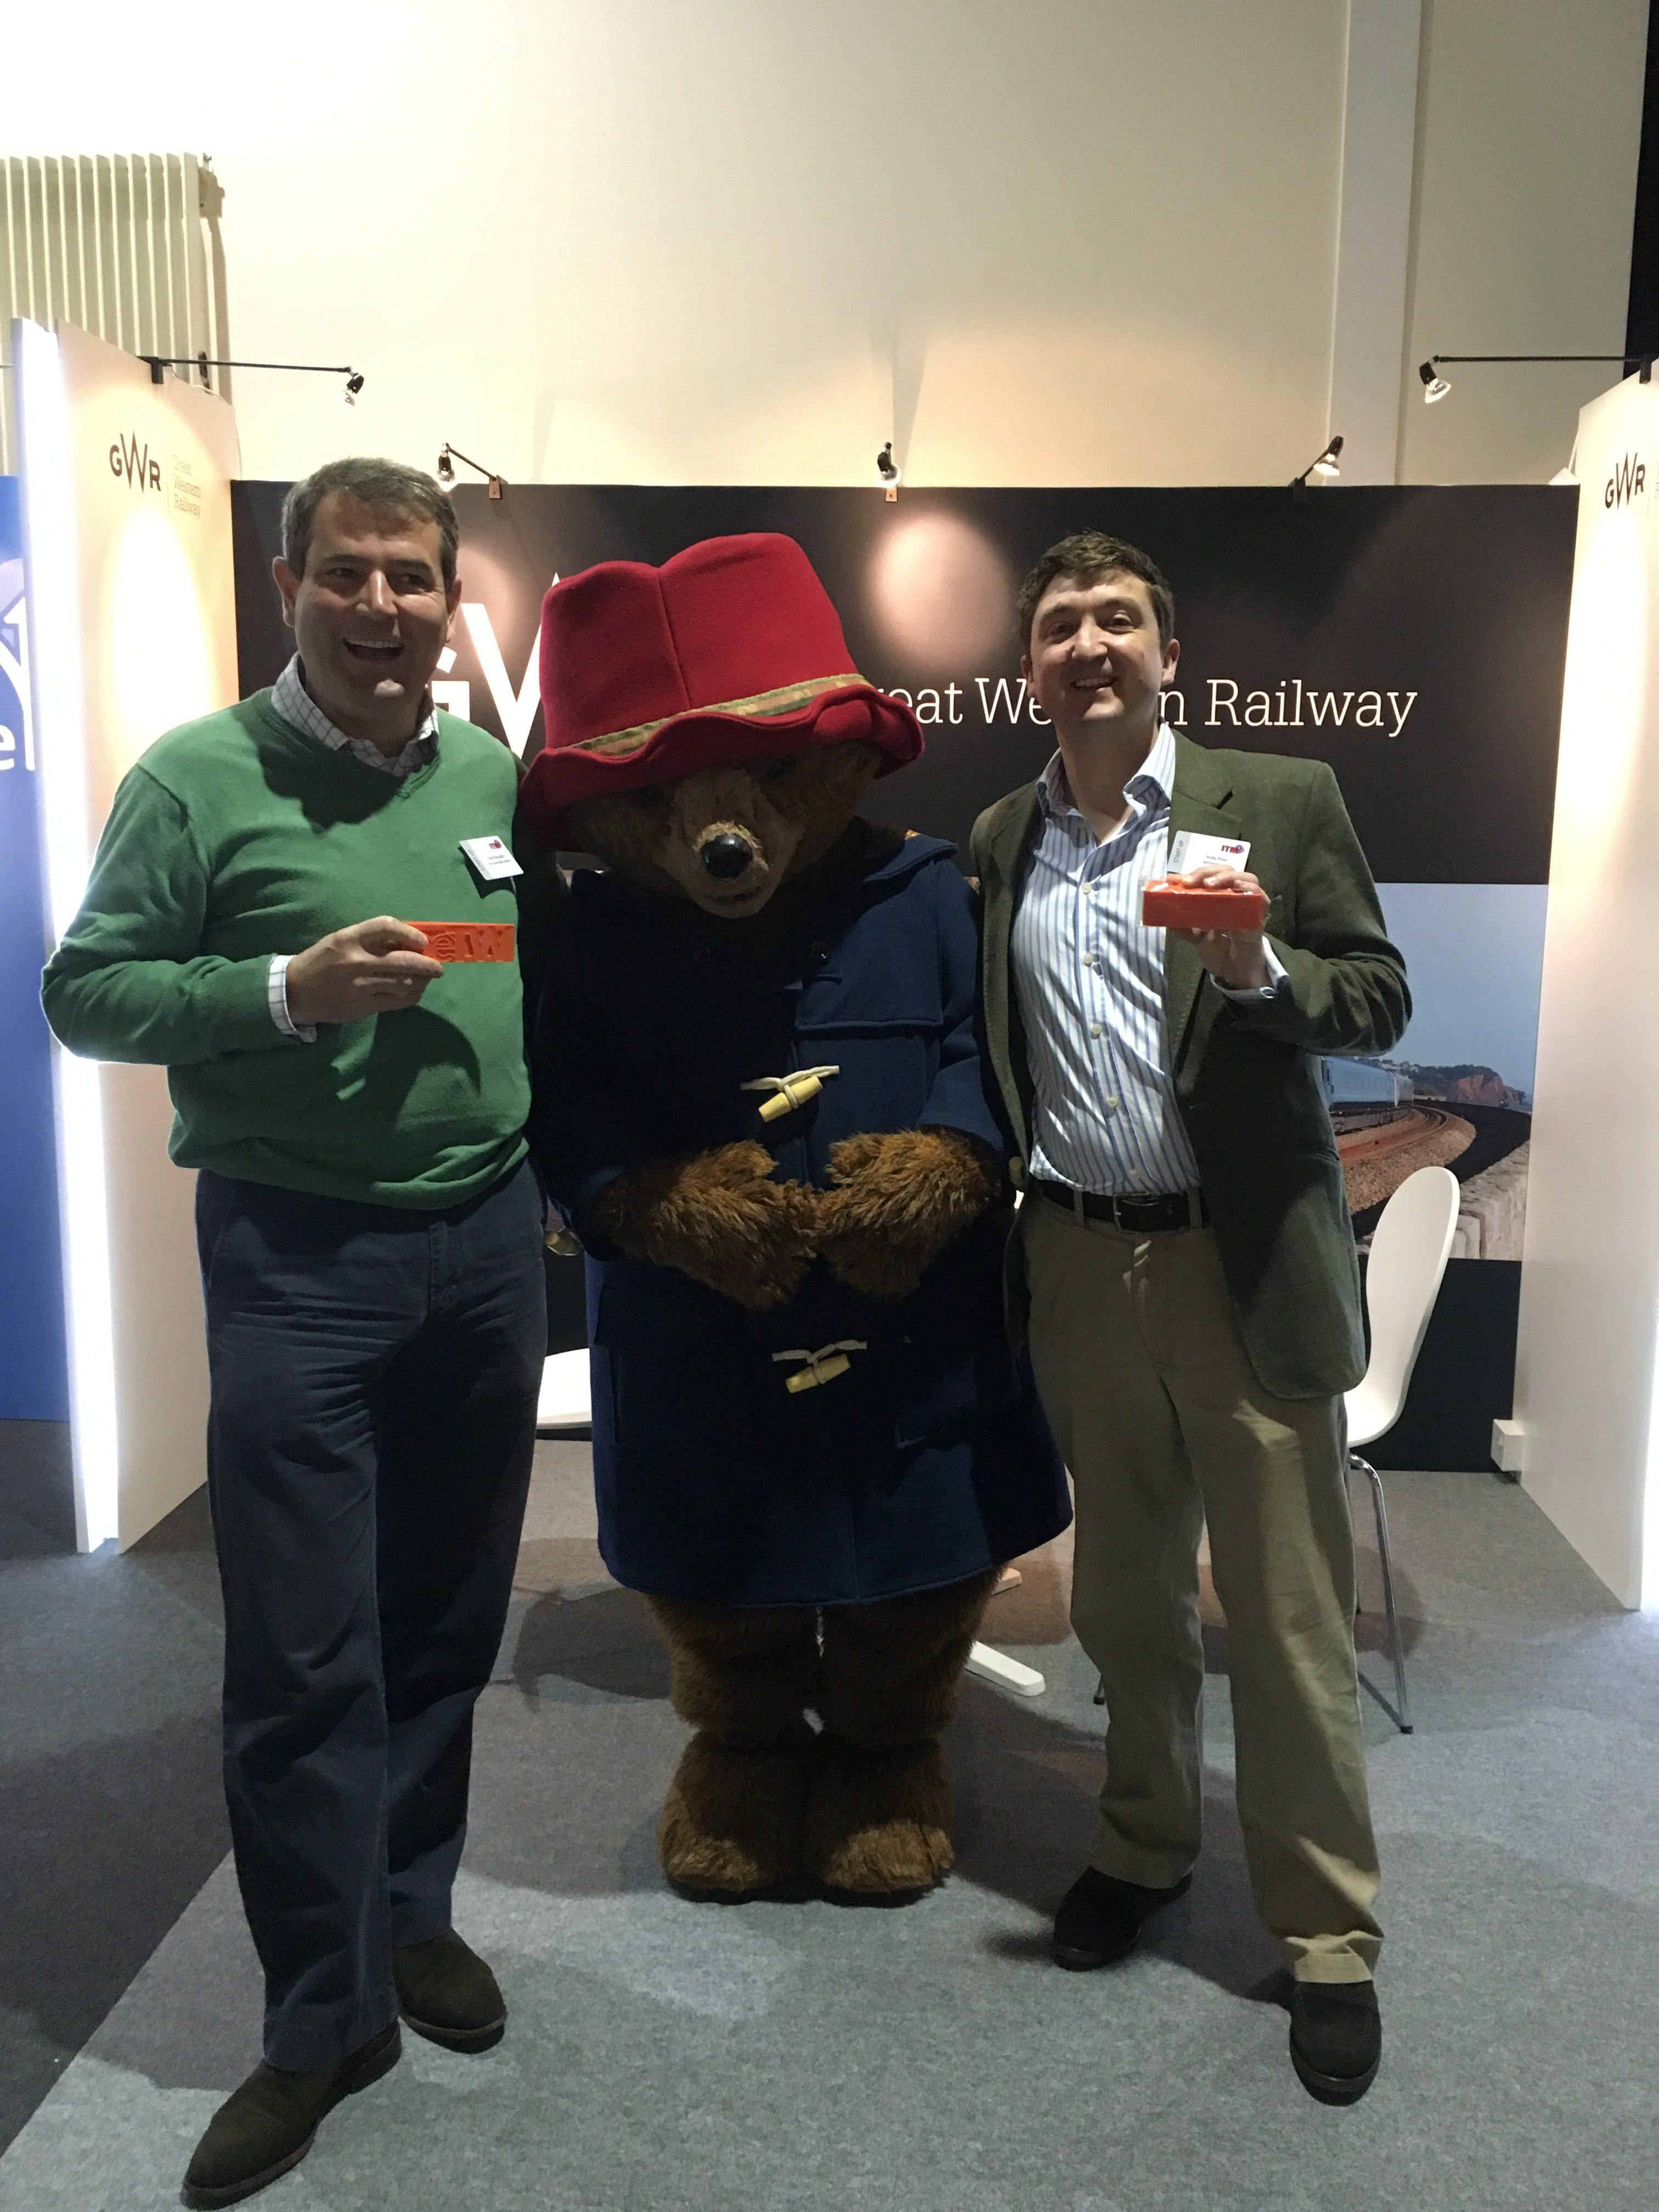 Even Paddington Bear can beTravelwise